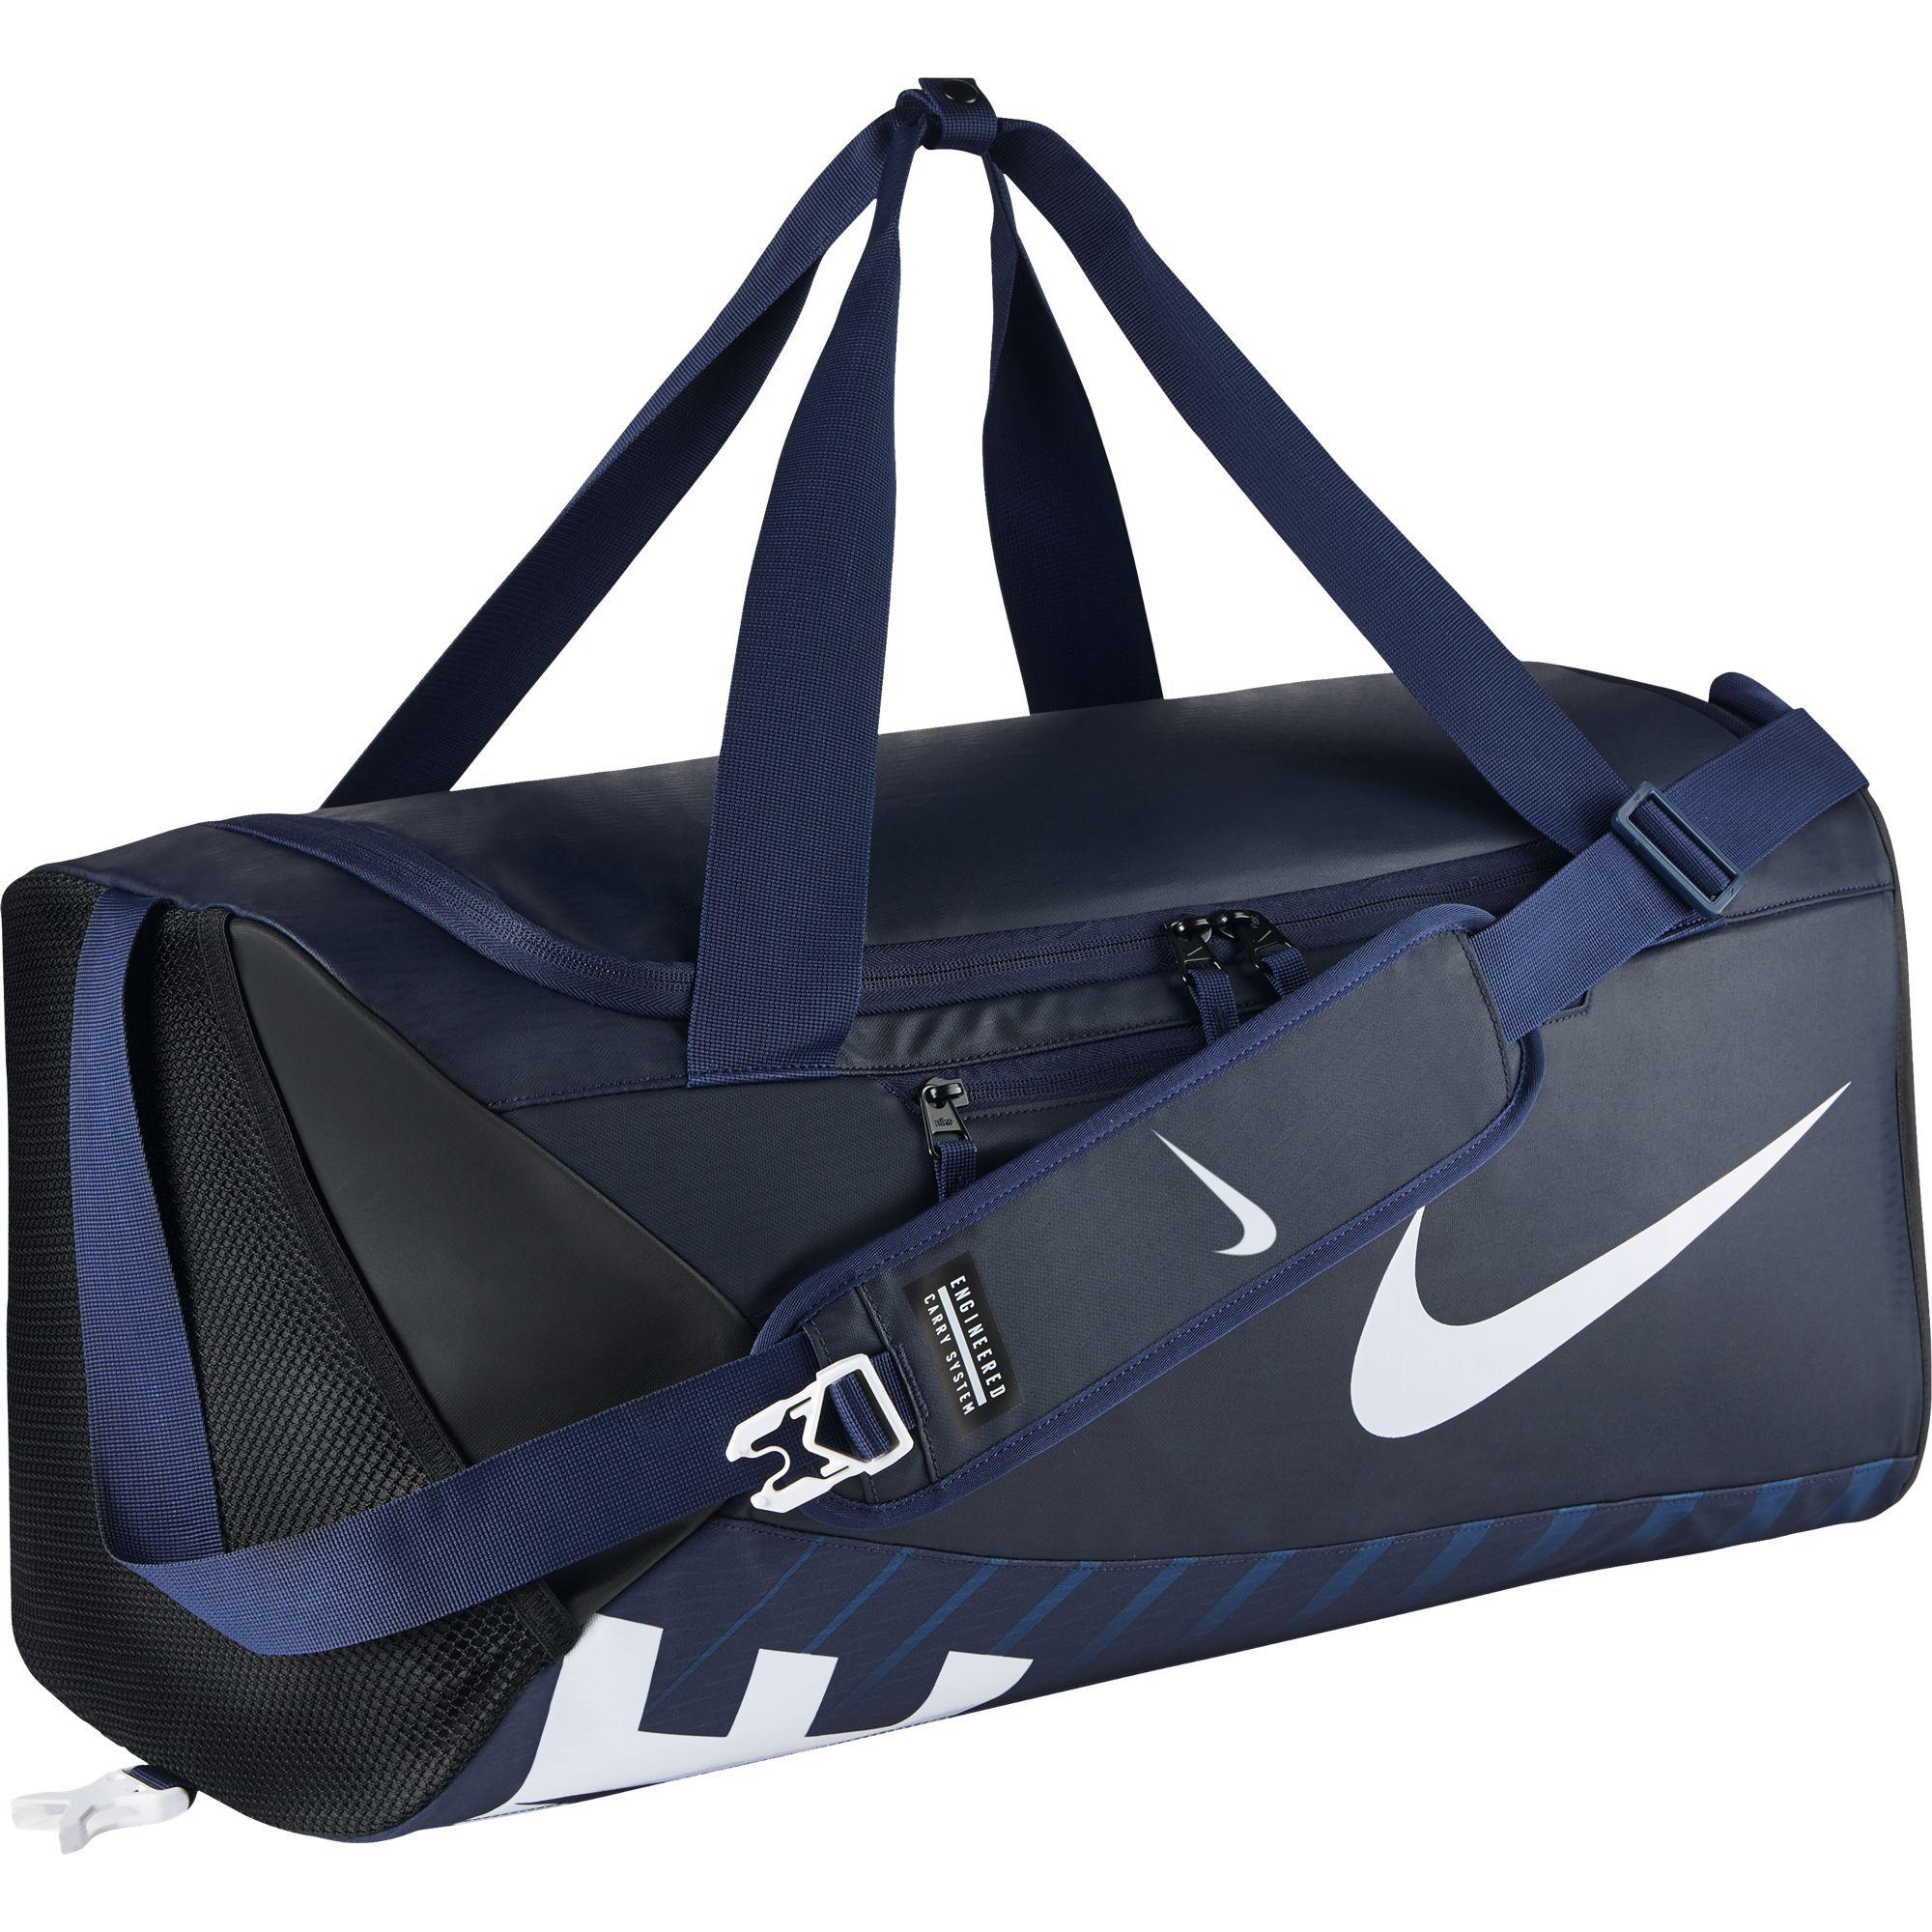 79deec77687 Nike Alpha Adapt Cross Body Medium Duffel Bag - Midnight Navy -  Tennisnuts.com